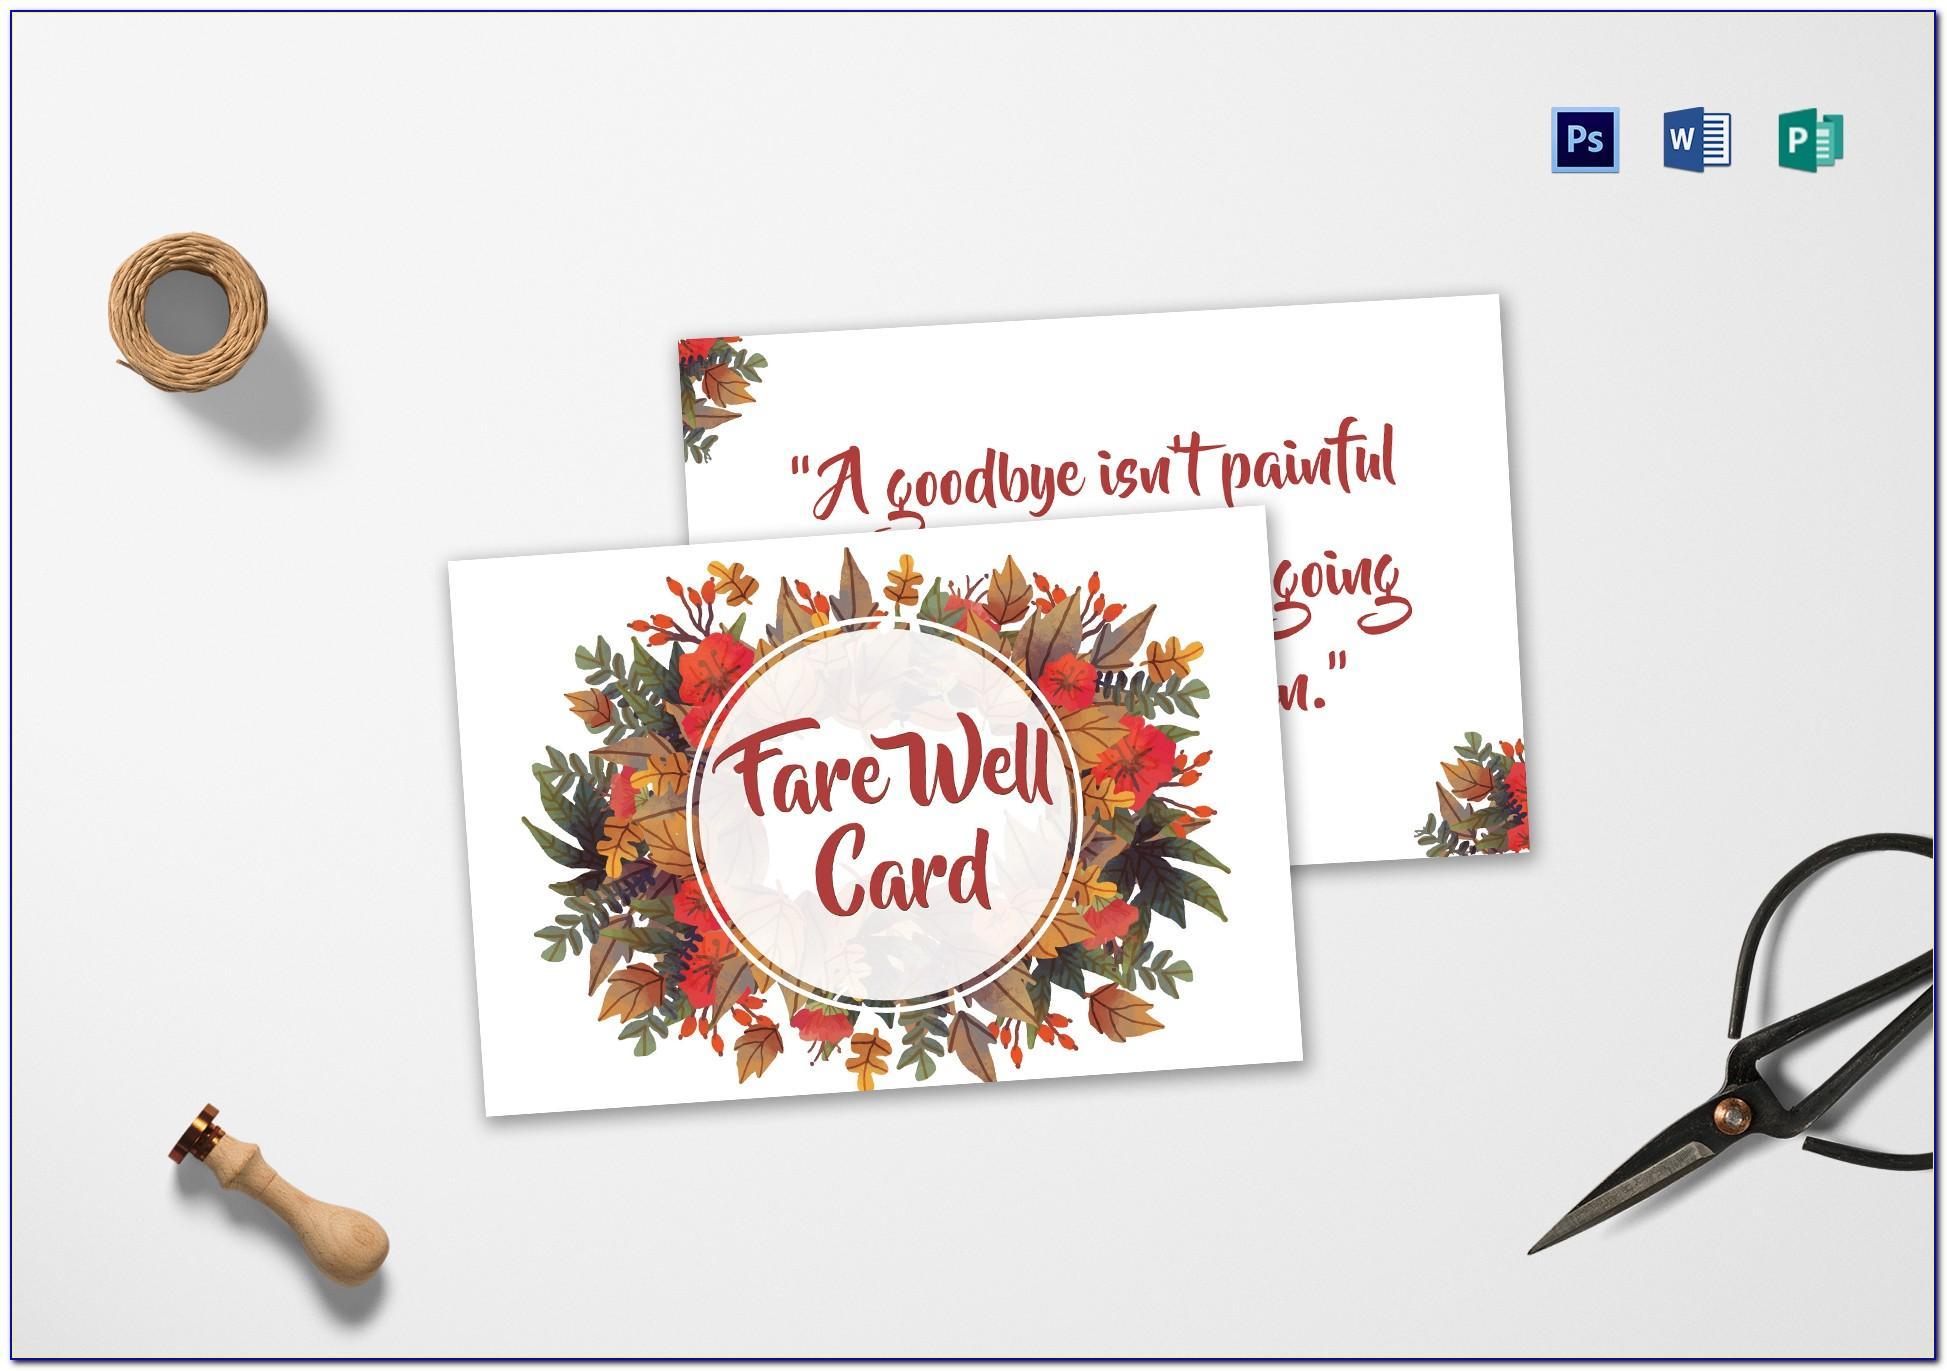 Farewell Card Template Photoshop